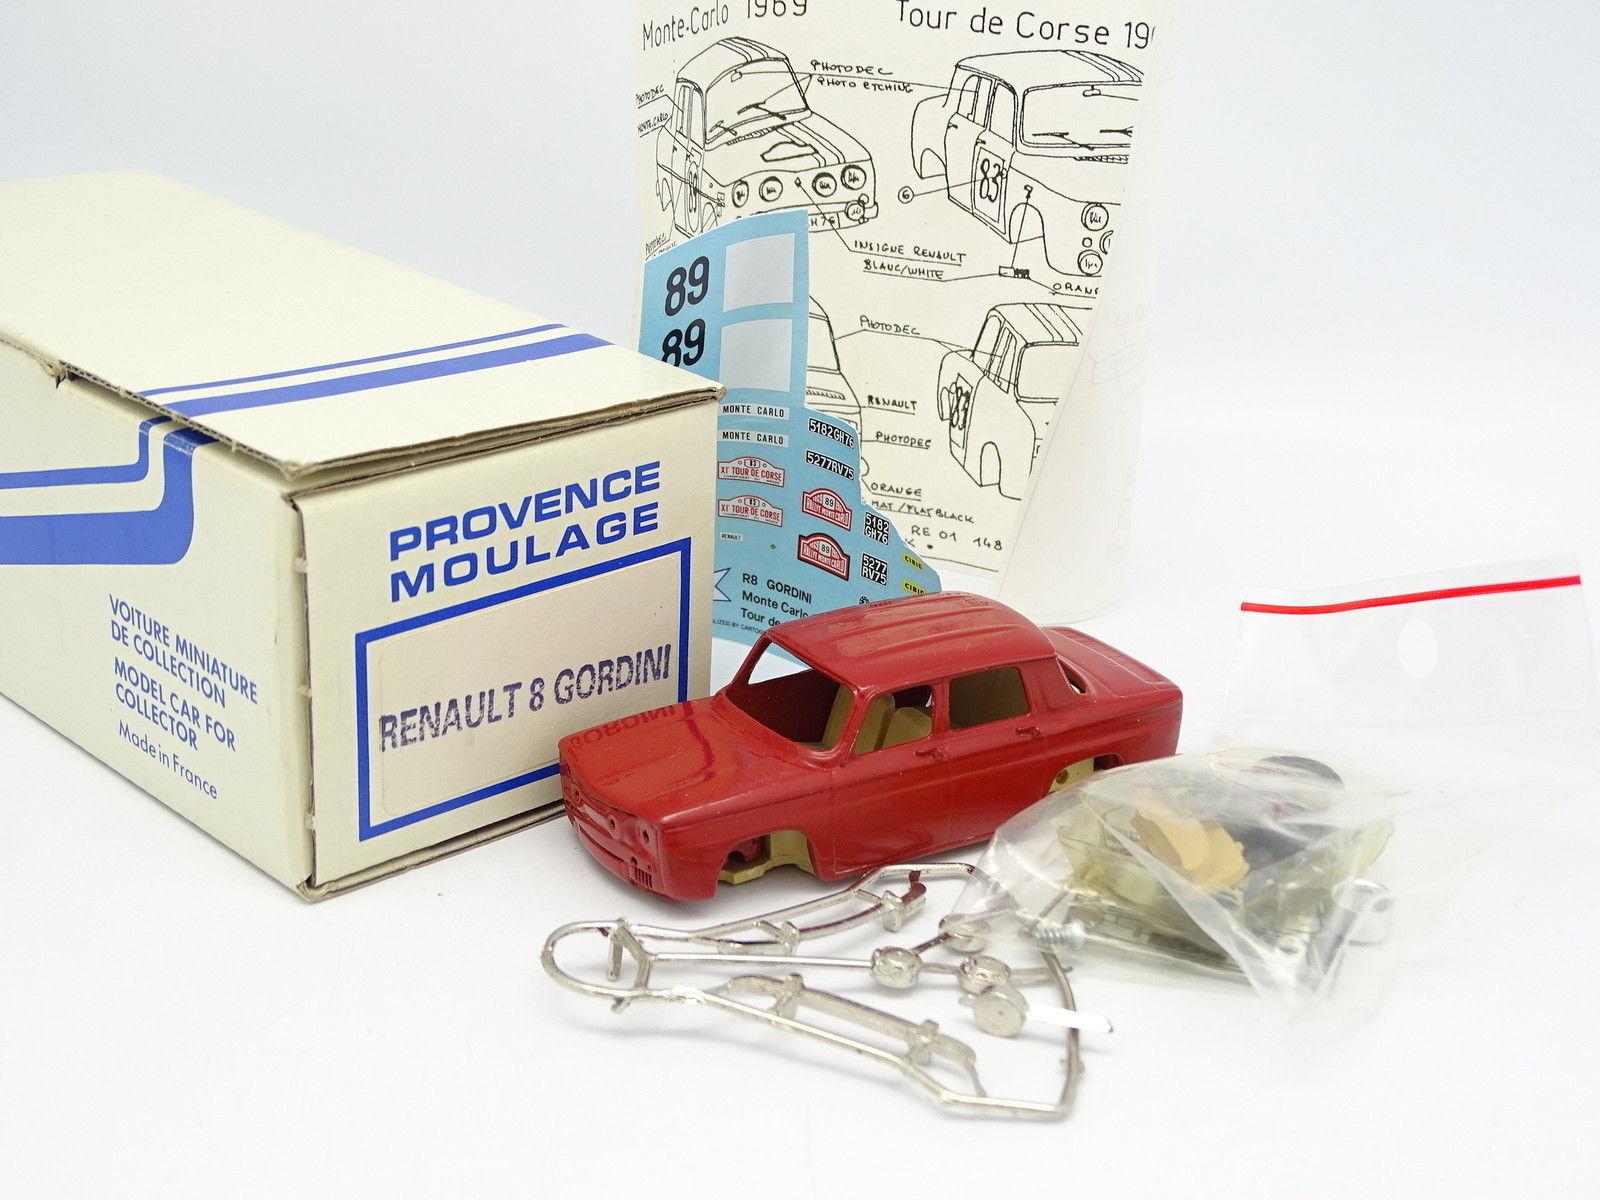 Provence Moulage Kit à Monter 1 43 - Renault 8 Gordini Rouge - Monte Carlo